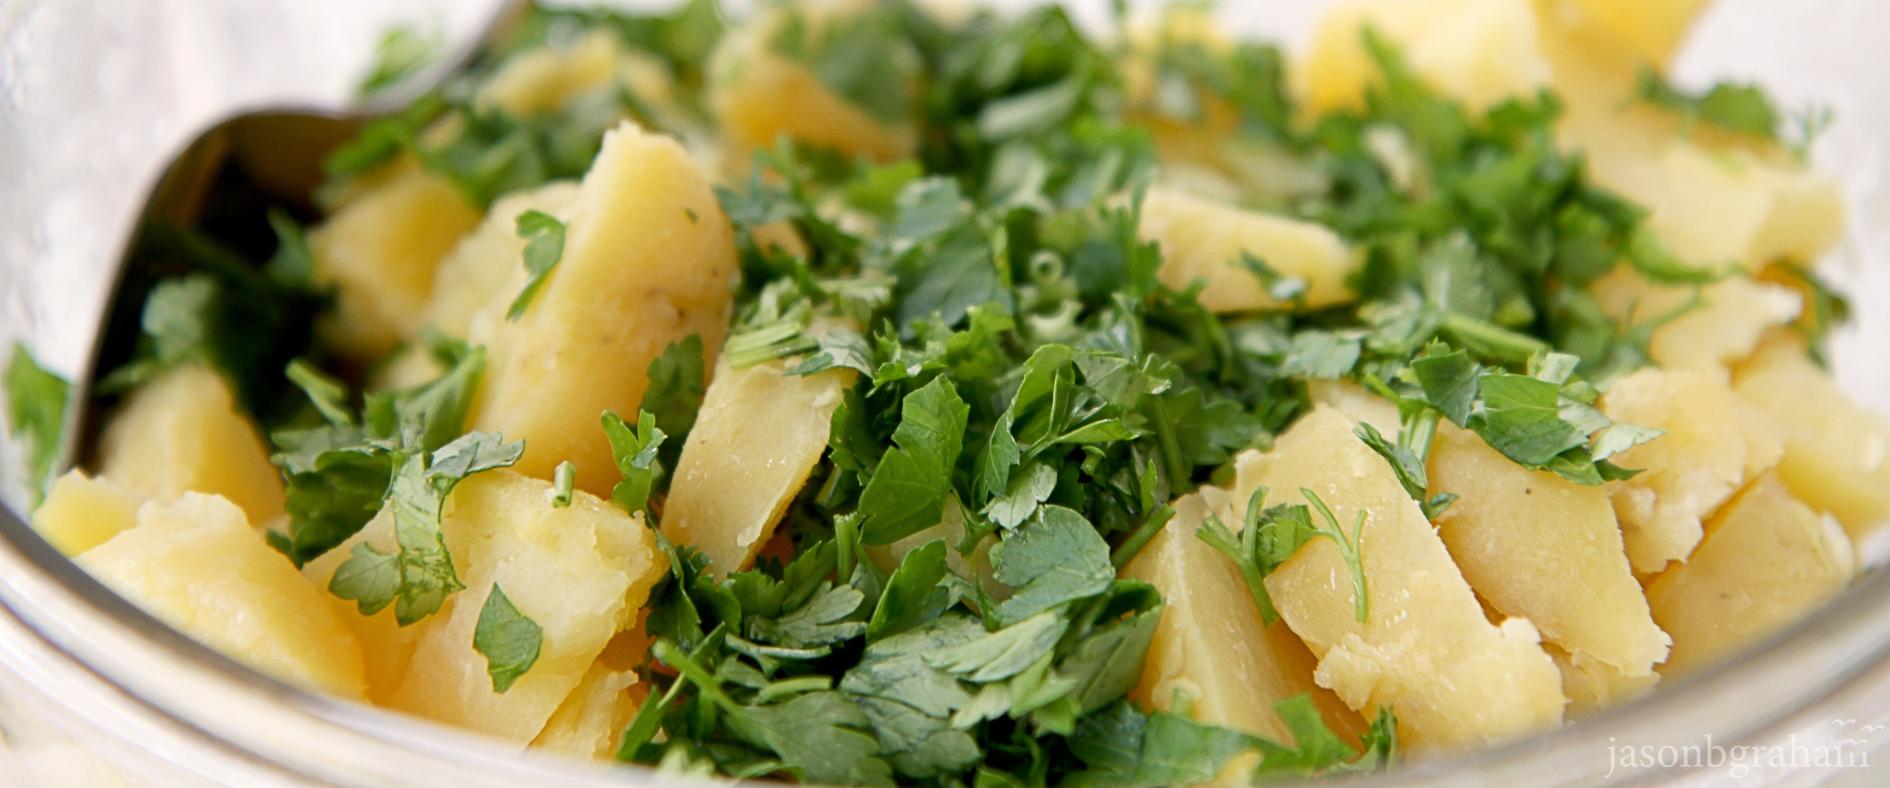 potatoes-8486